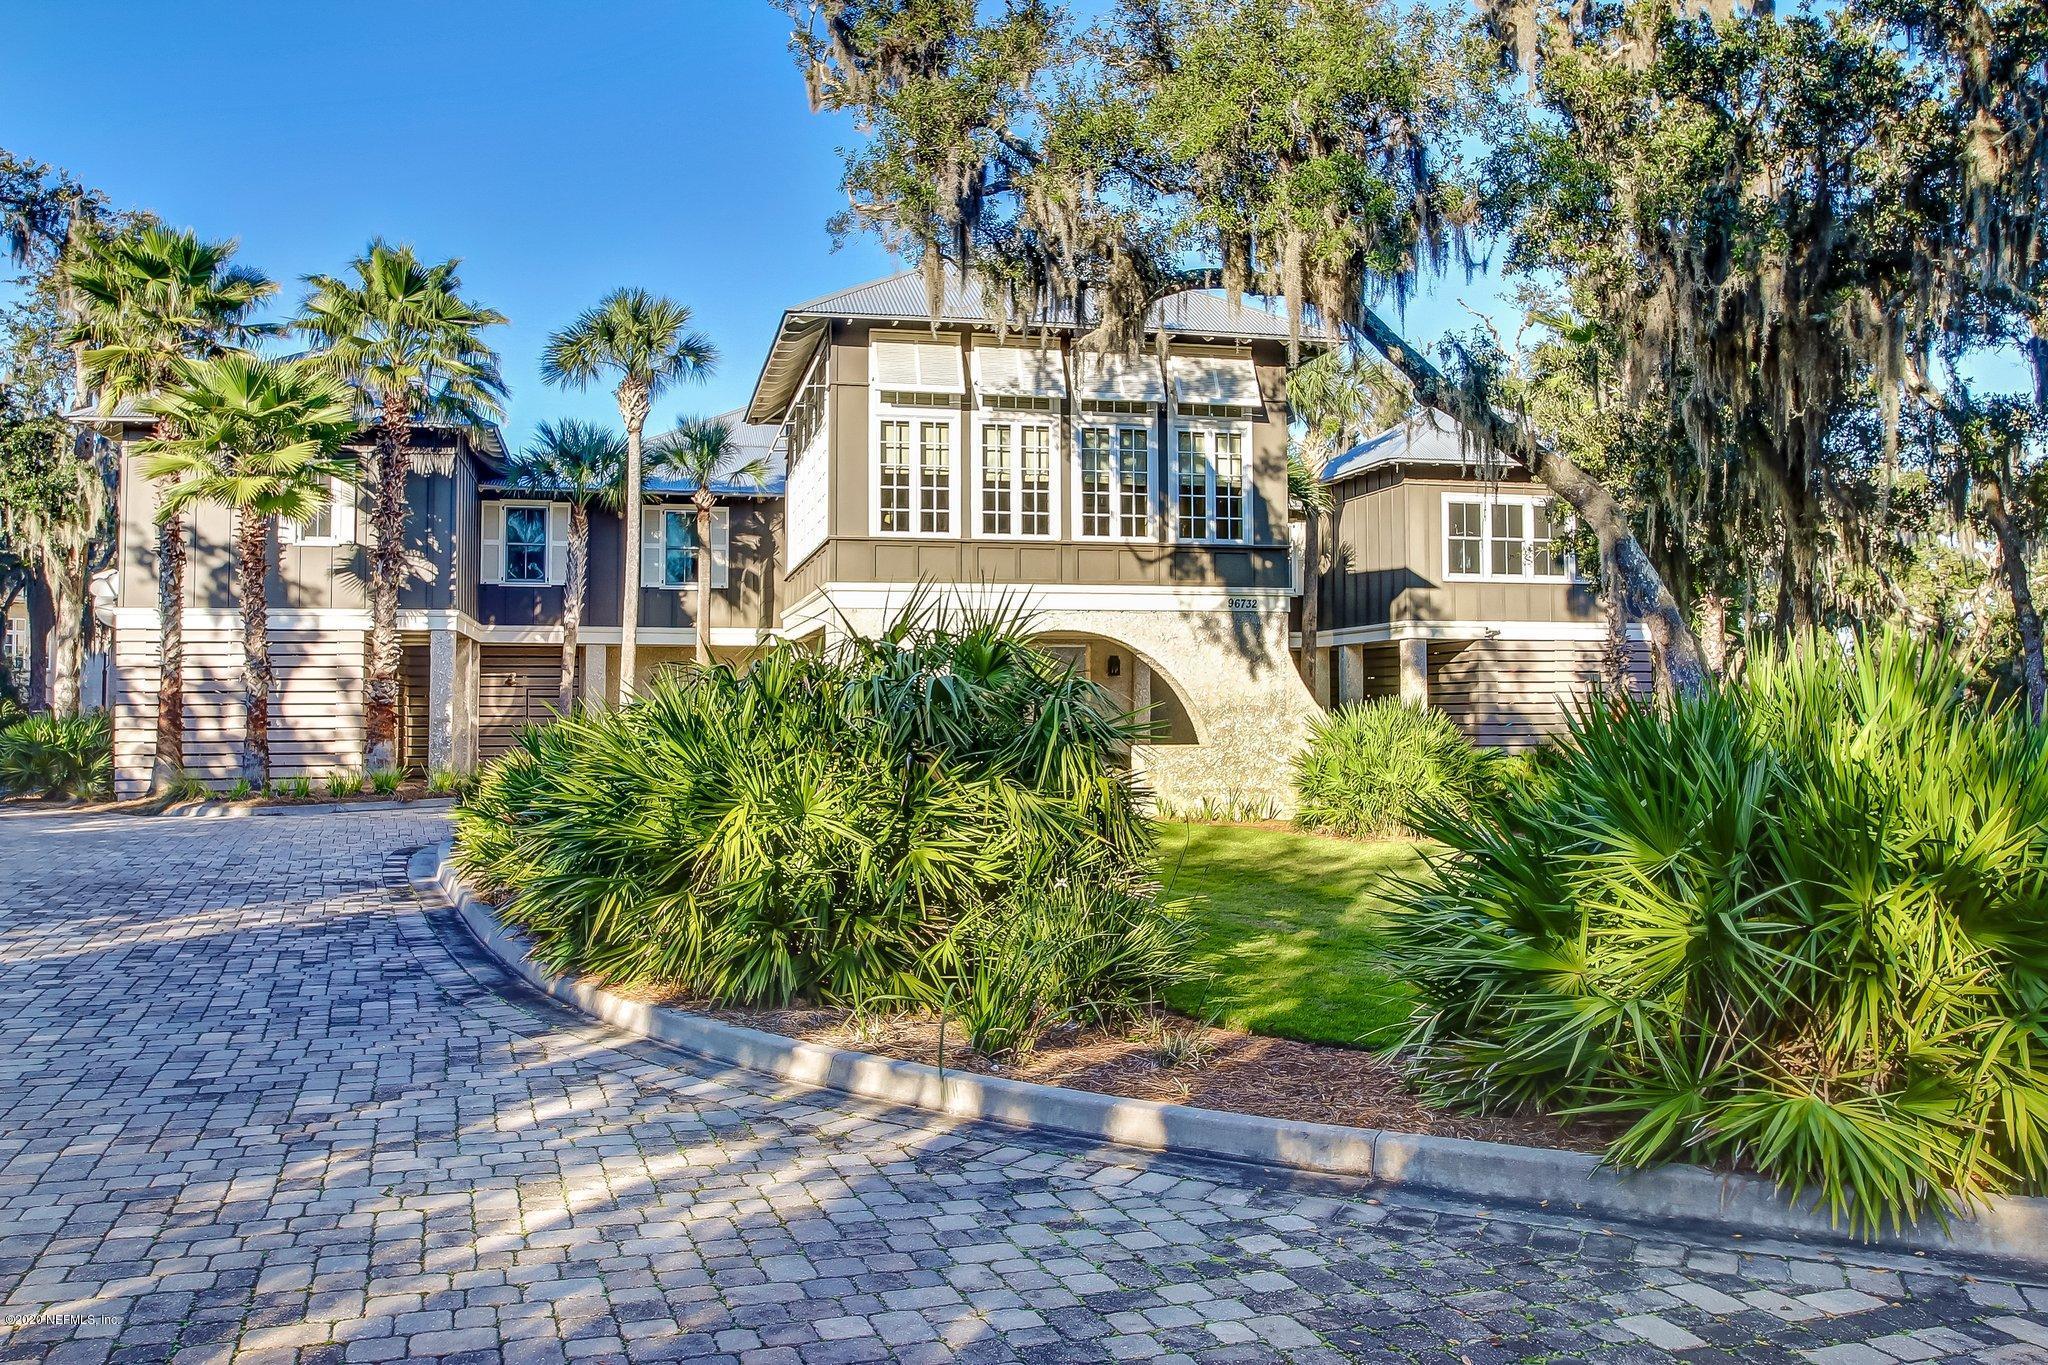 96456 BAY VIEW, FERNANDINA BEACH, FLORIDA 32034, ,3 BathroomsBathrooms,Residential,For sale,BAY VIEW,1080814